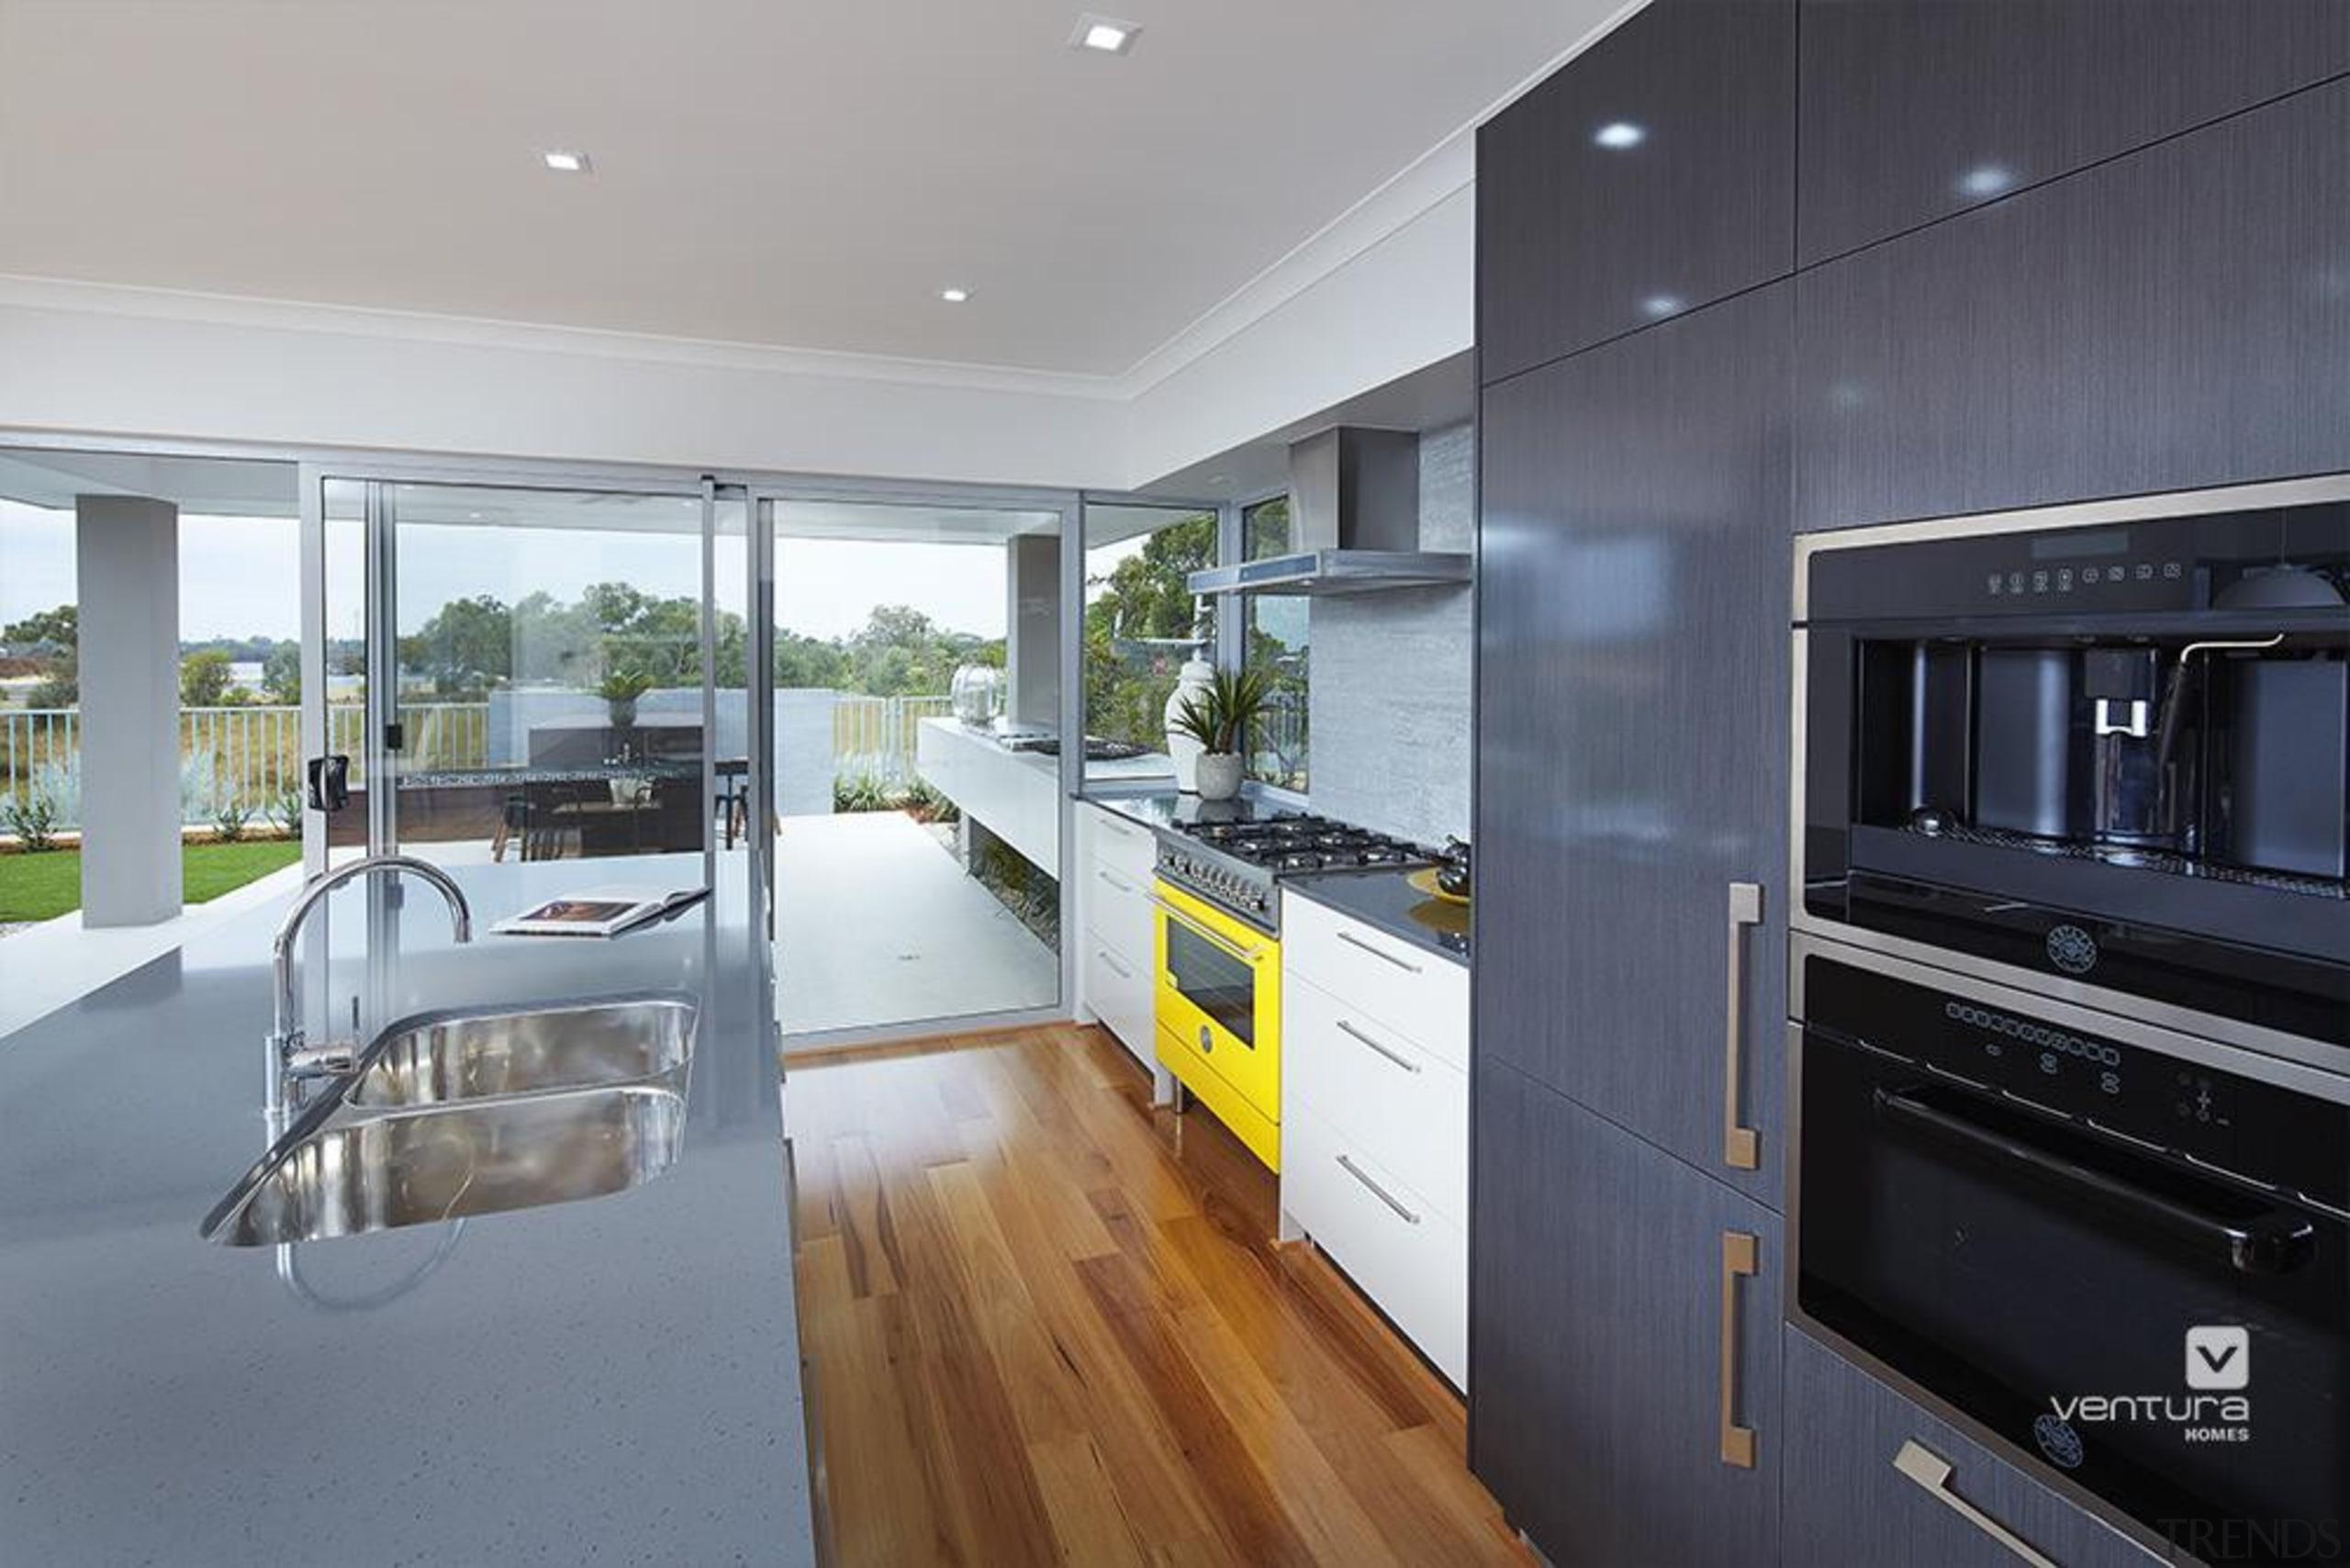 Kitchen design. - The Monterosso Two Storey Display architecture, countertop, house, interior design, kitchen, real estate, gray